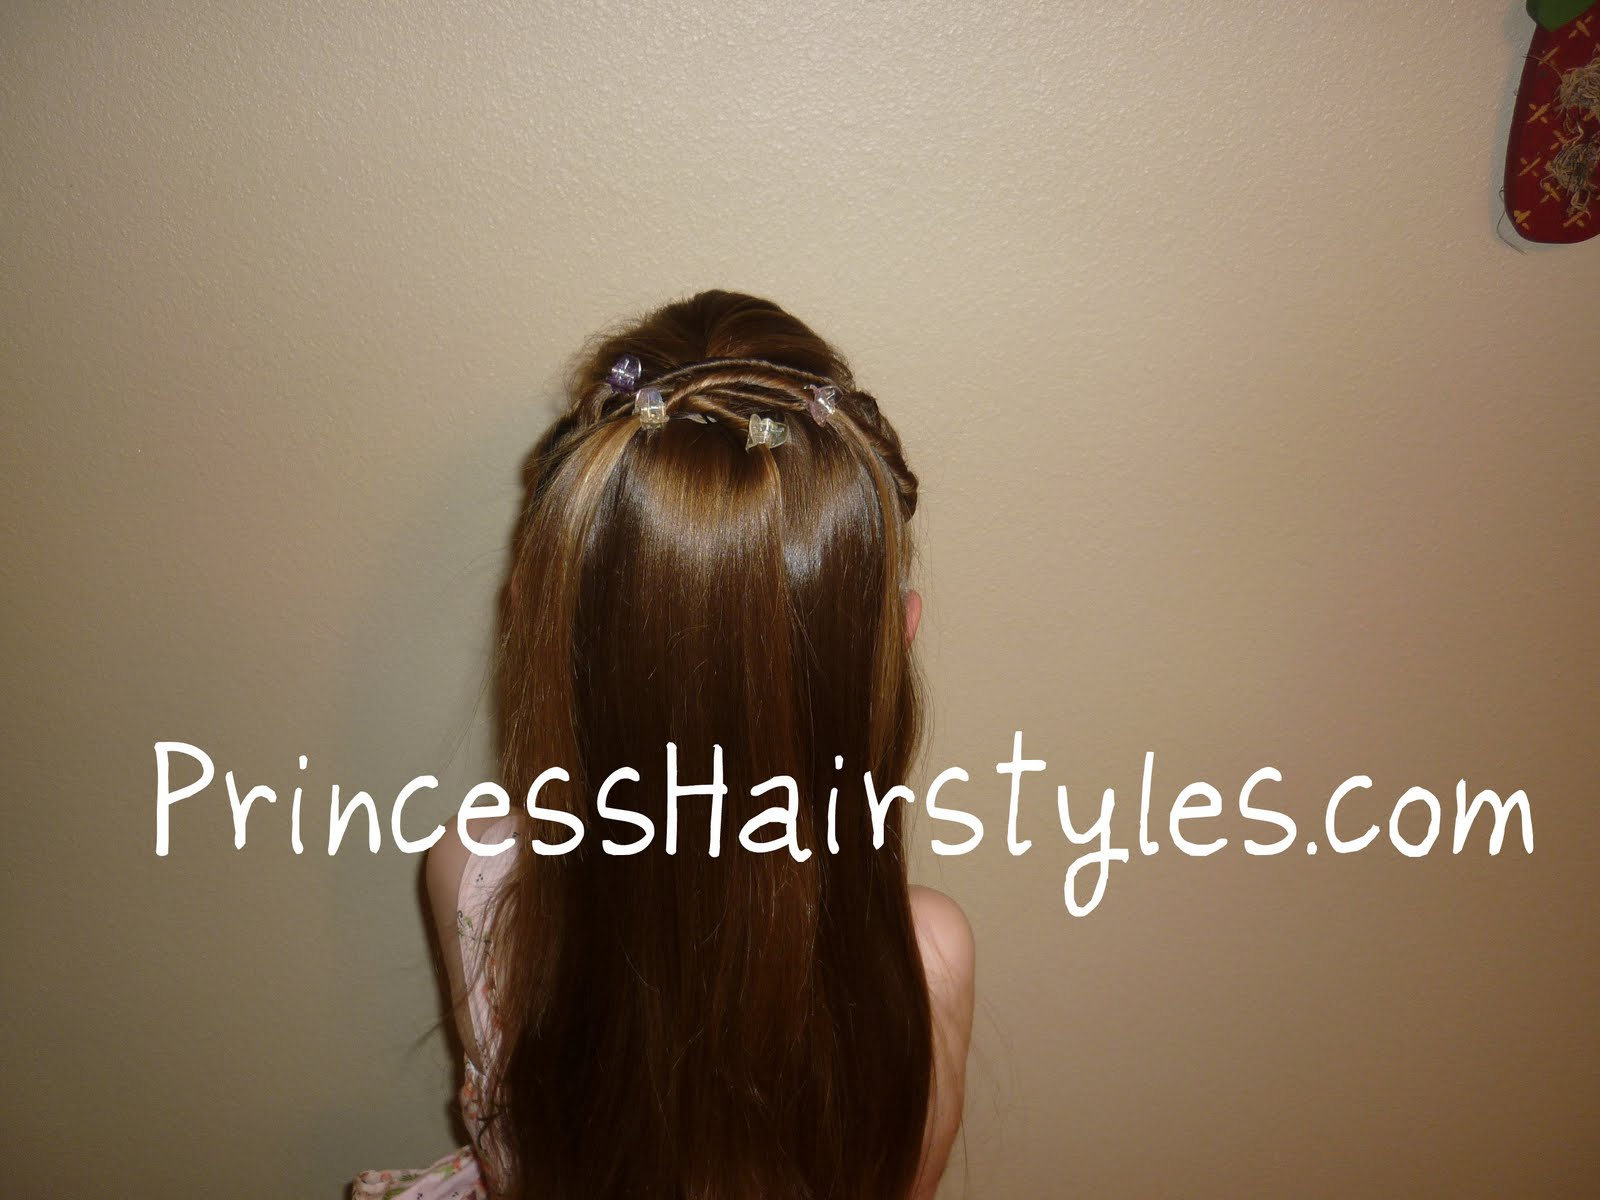 Stupendous Tween Twists Princess Hairstyle Hairstyles For Girls Princess Short Hairstyles Gunalazisus